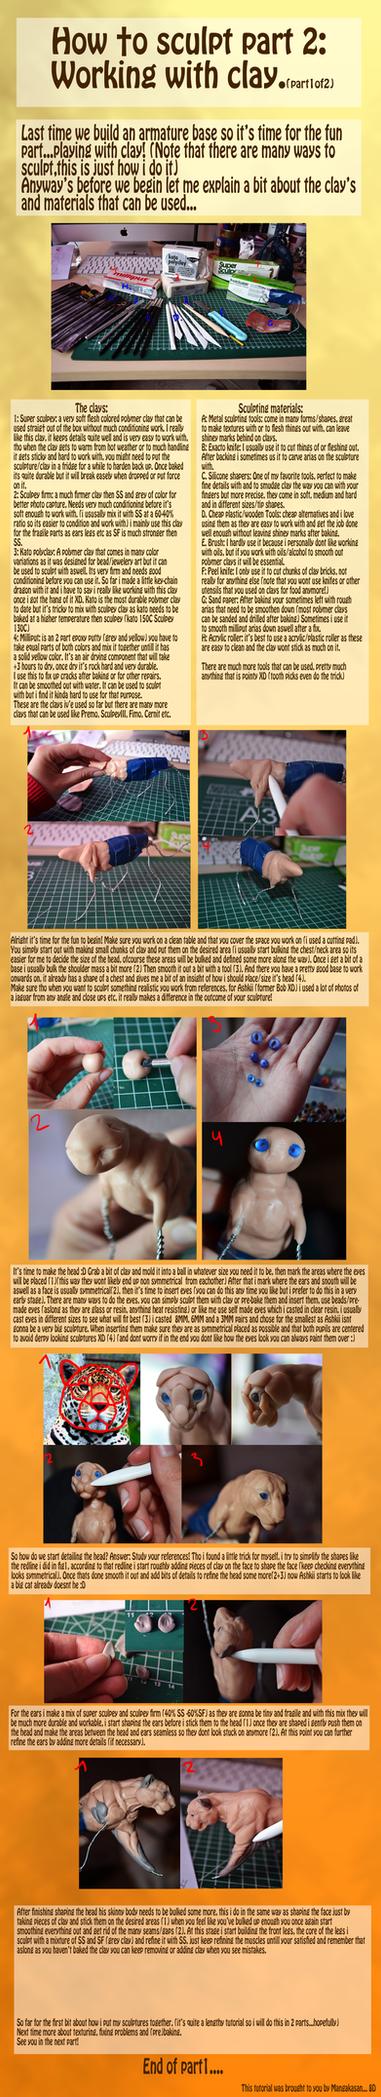 Sculpting tut part 2 1 of 2. reupload by mangakasan